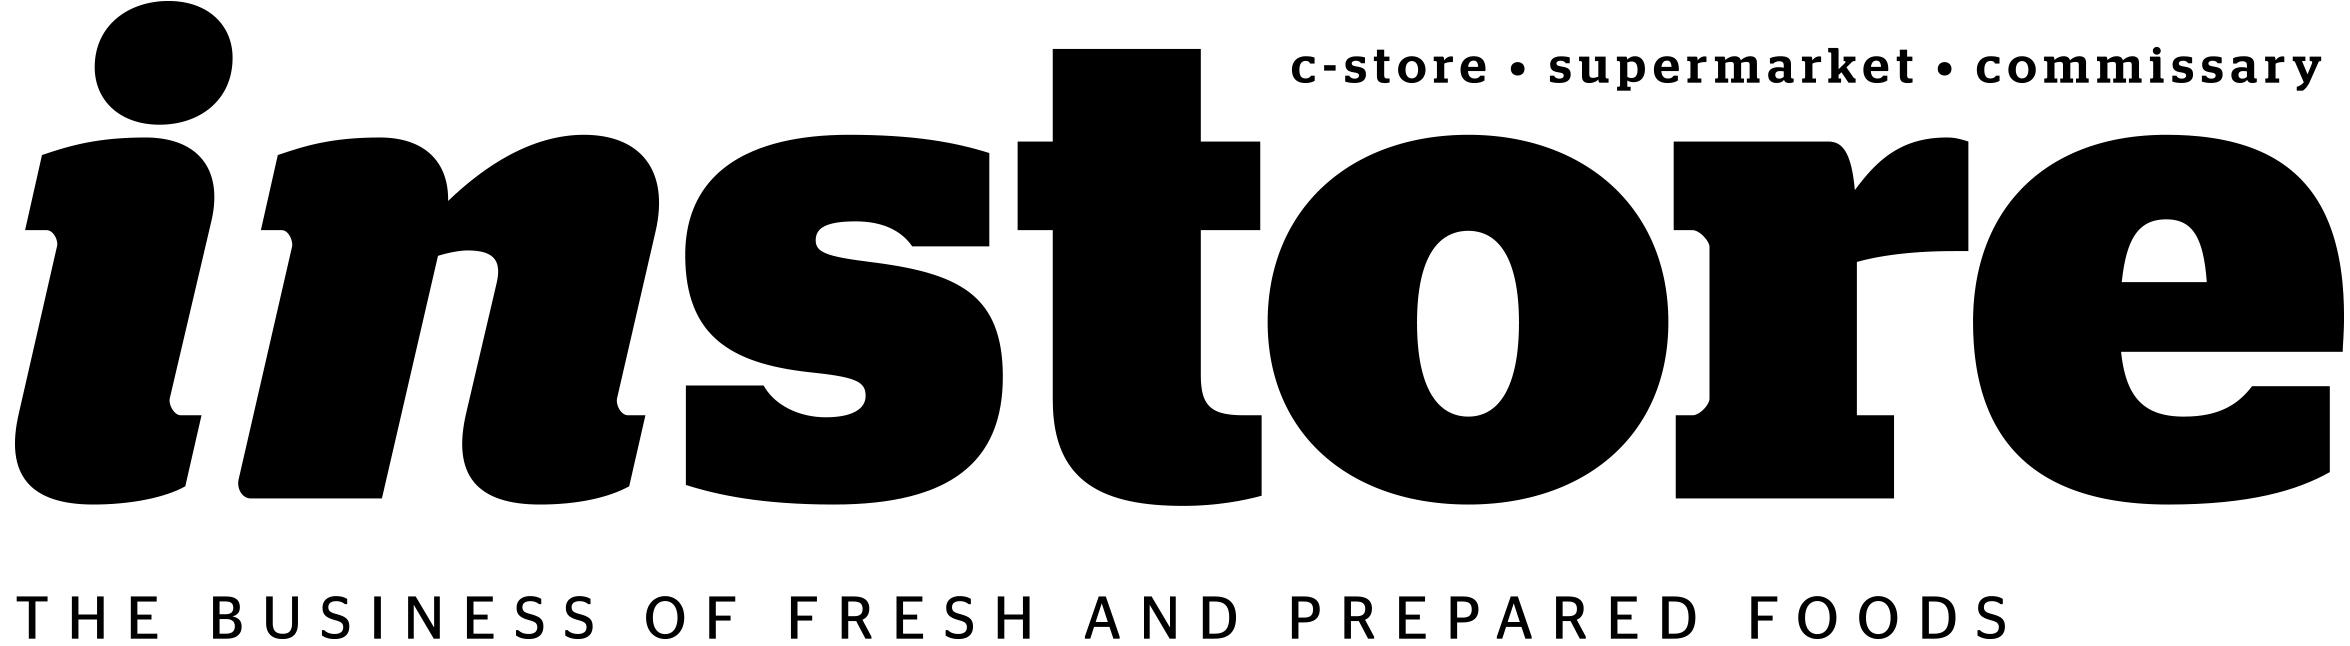 Instore_W_commissary_logo0116_bw